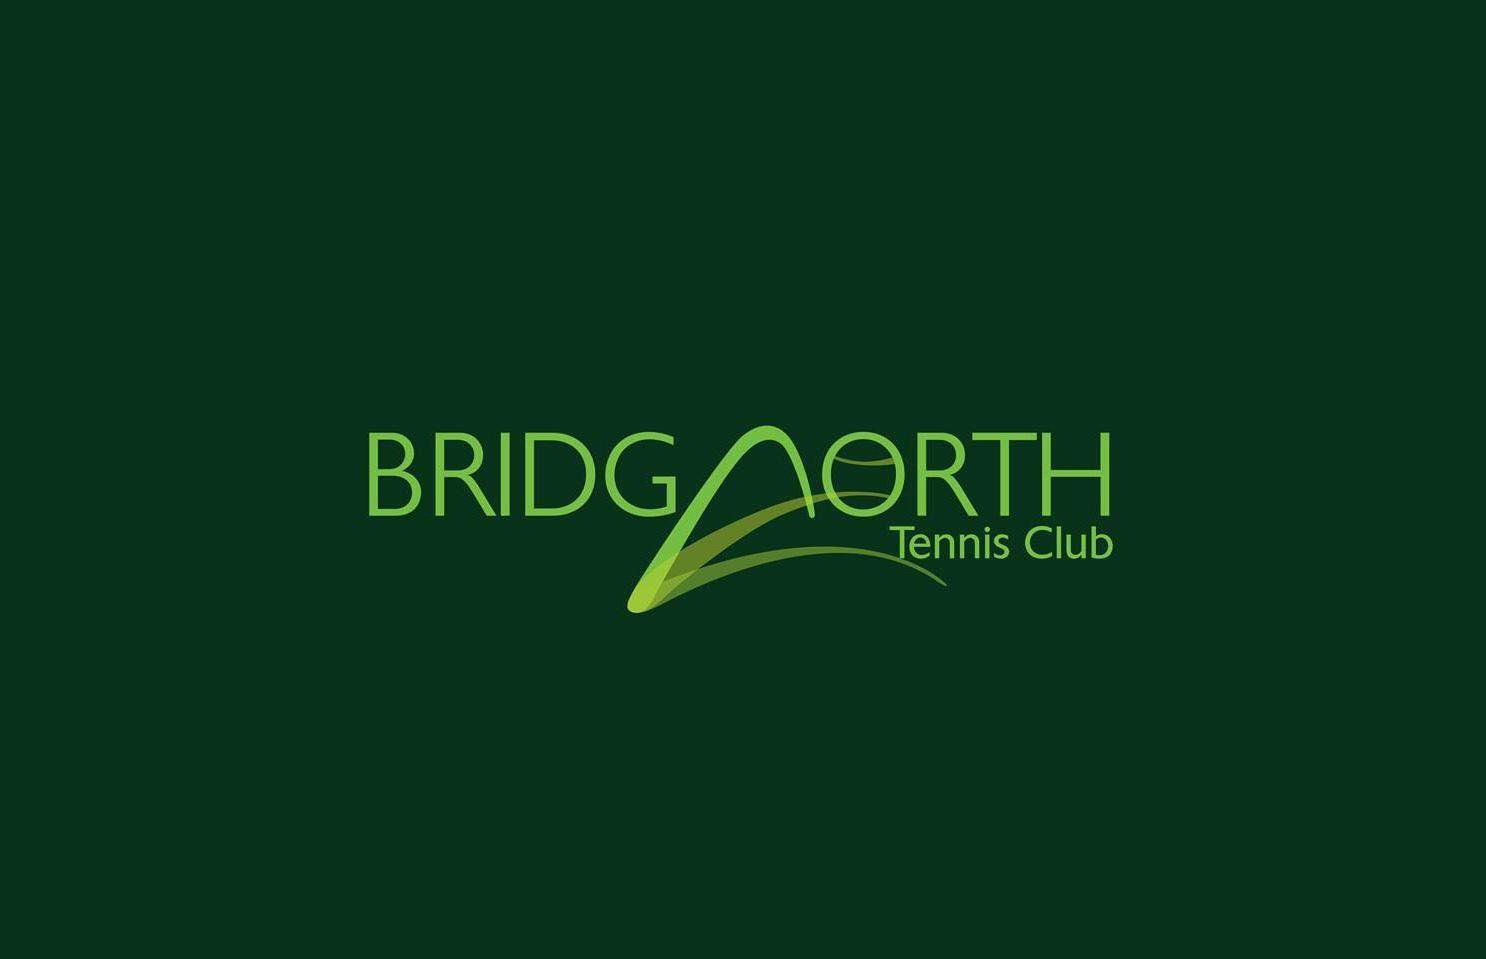 Bridgnorth Tennis Club